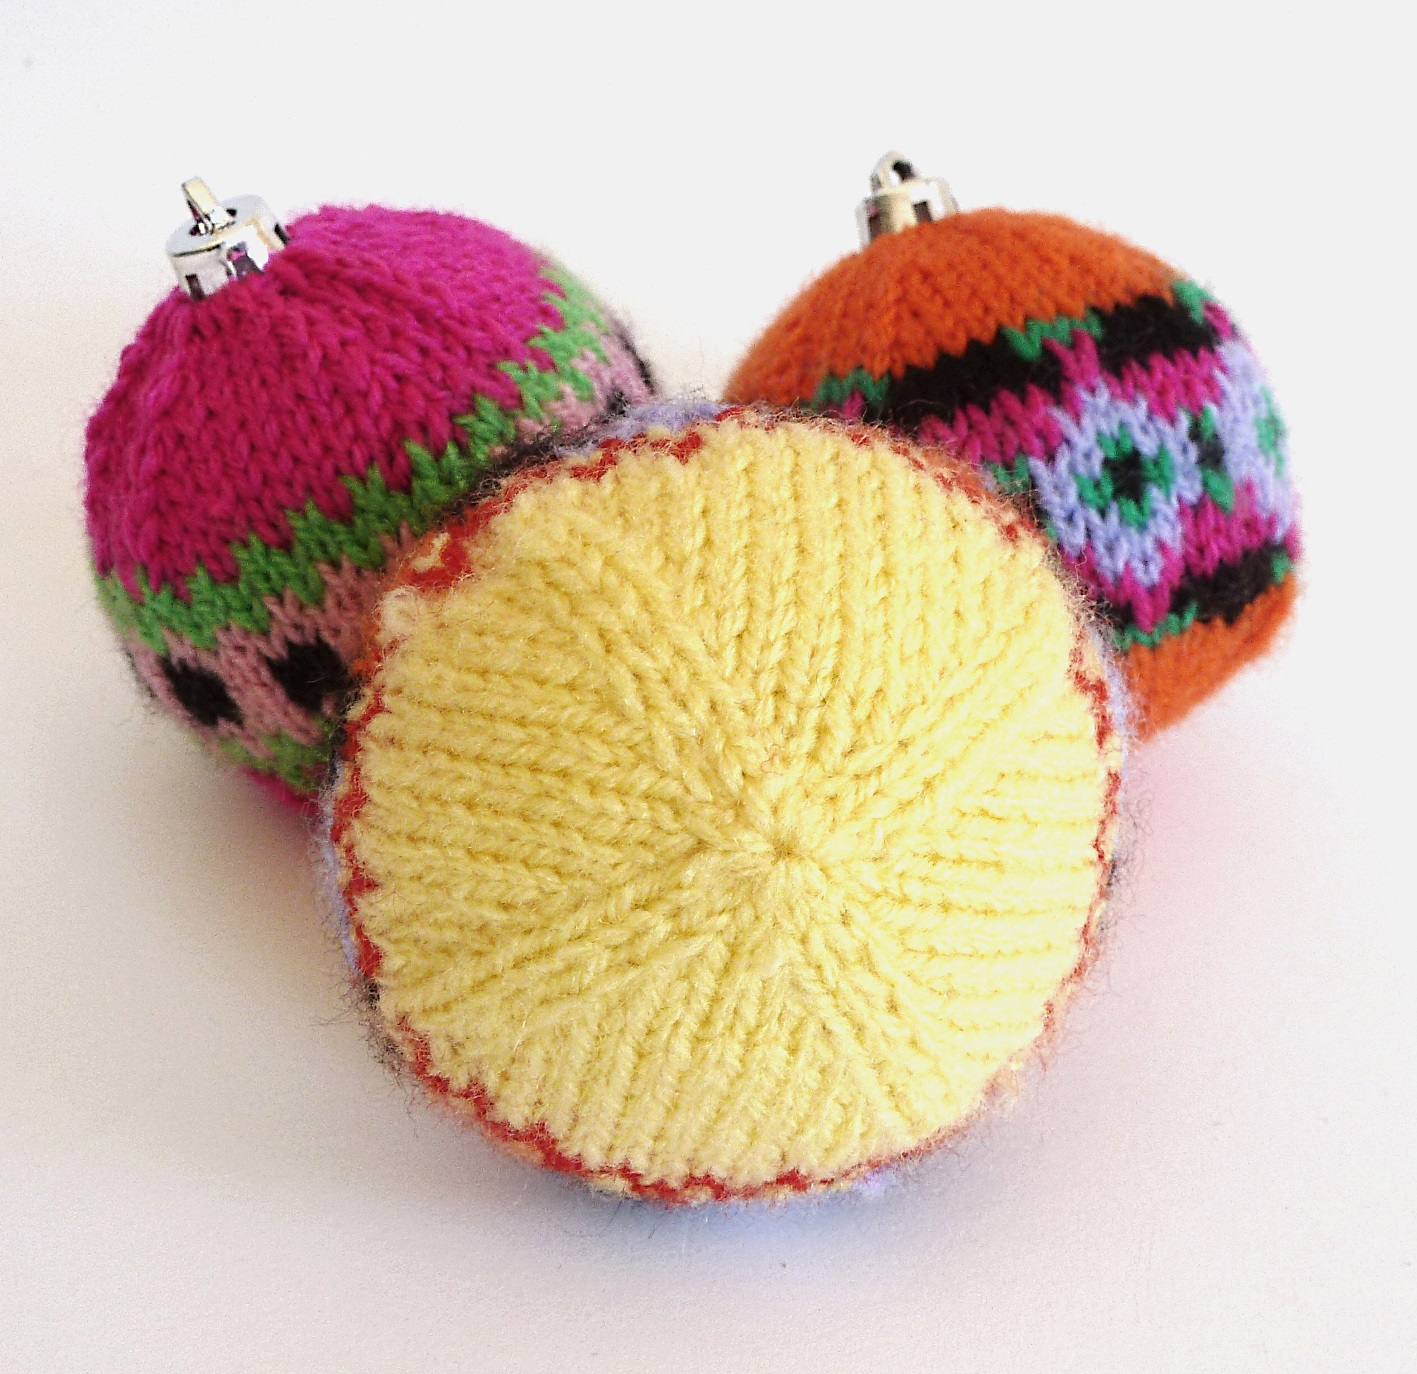 Franciens haakwerk: Knitting, how I increase stitches